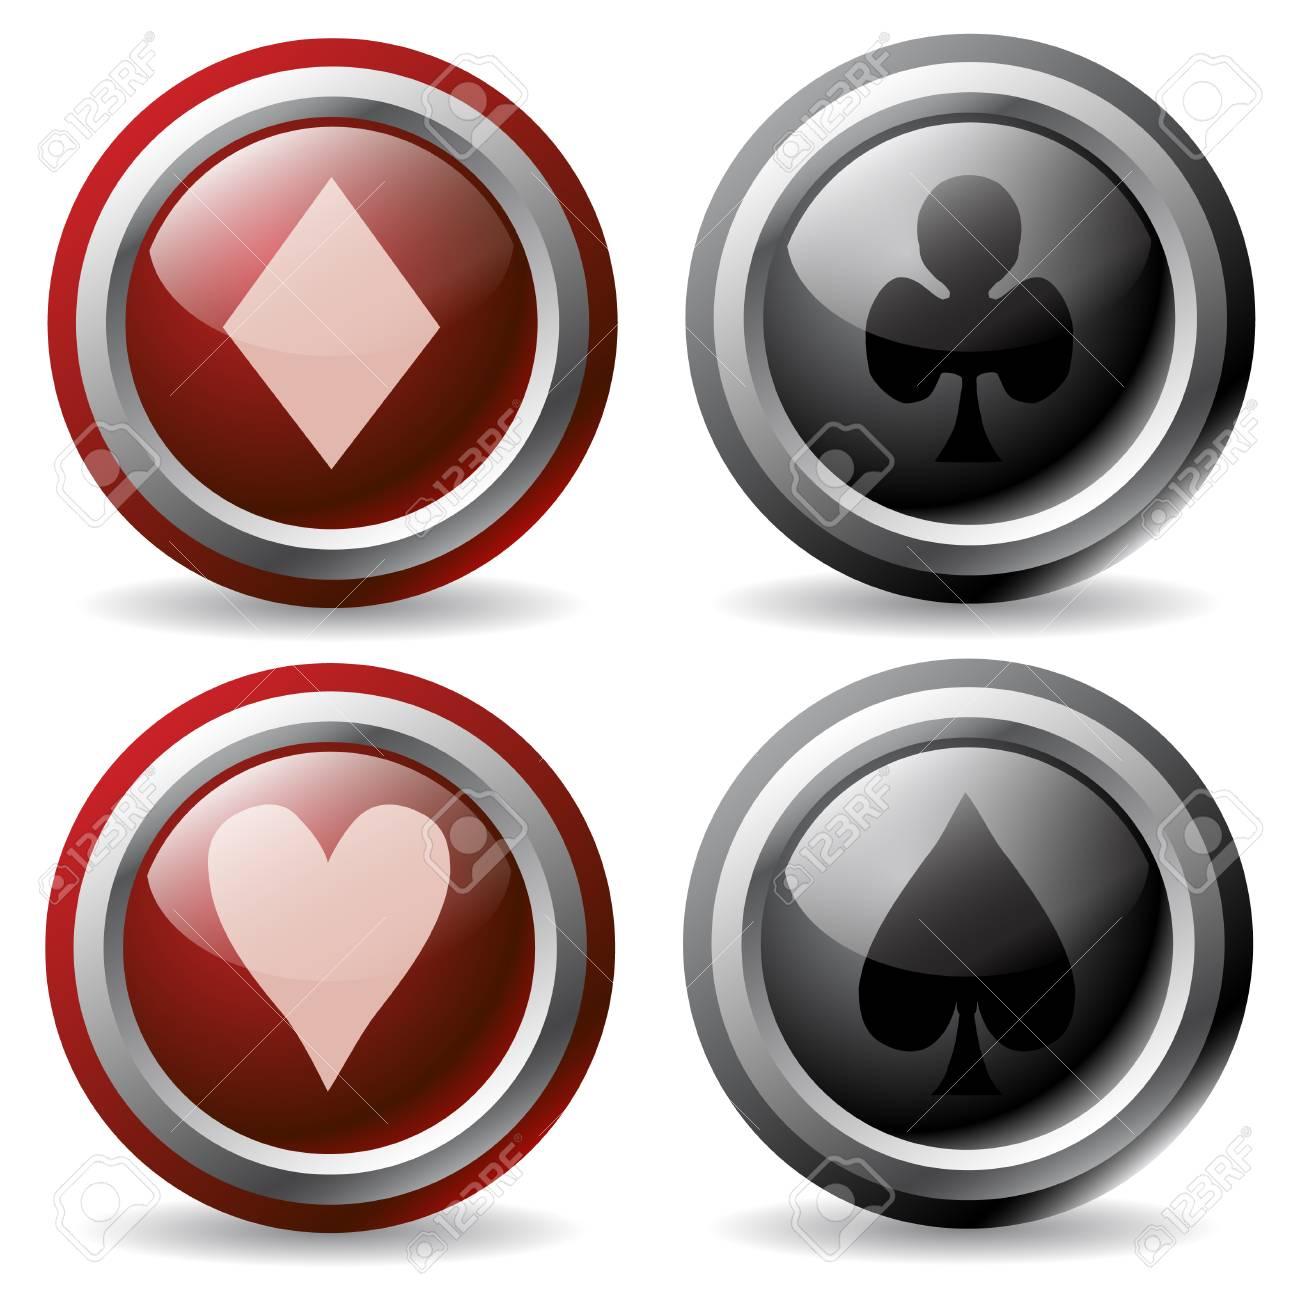 Poker Buttons Stock Vector - 6716810